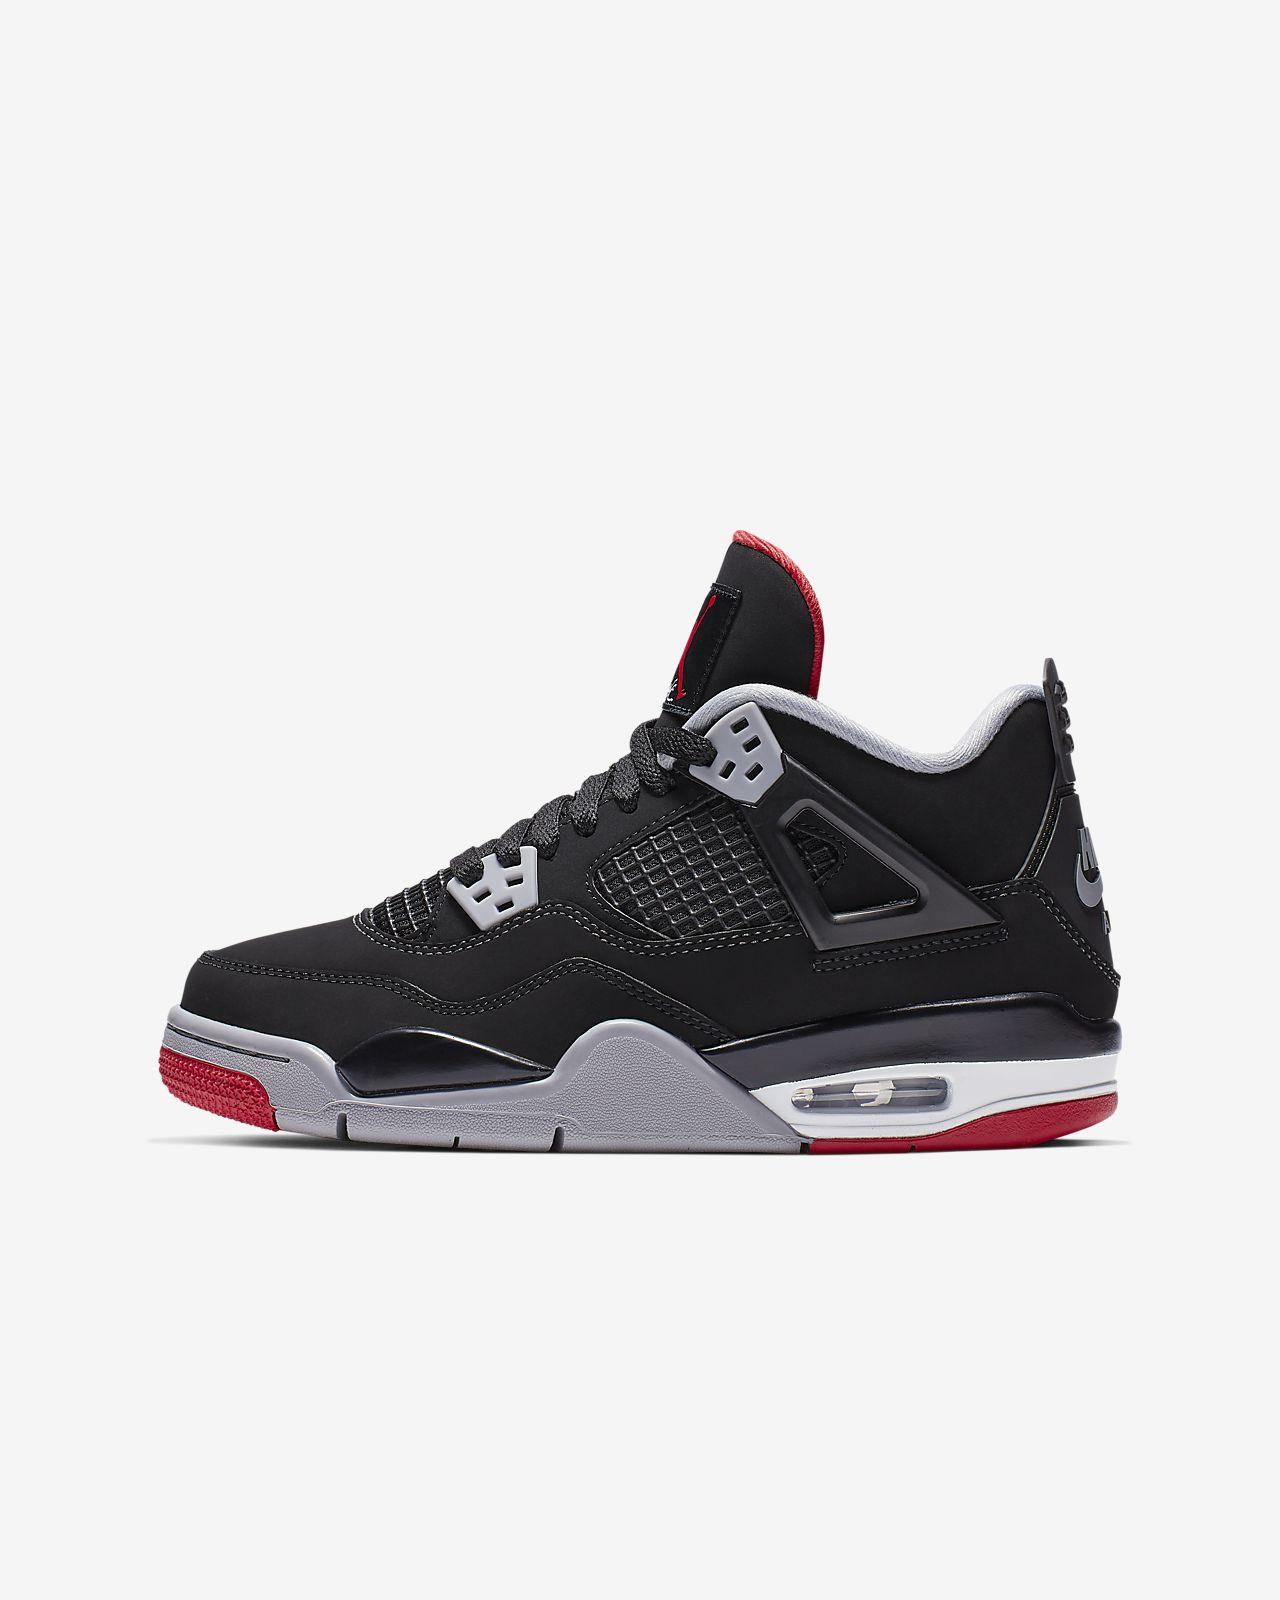 huge discount ccc51 60d89 Air Jordan 4 Retro